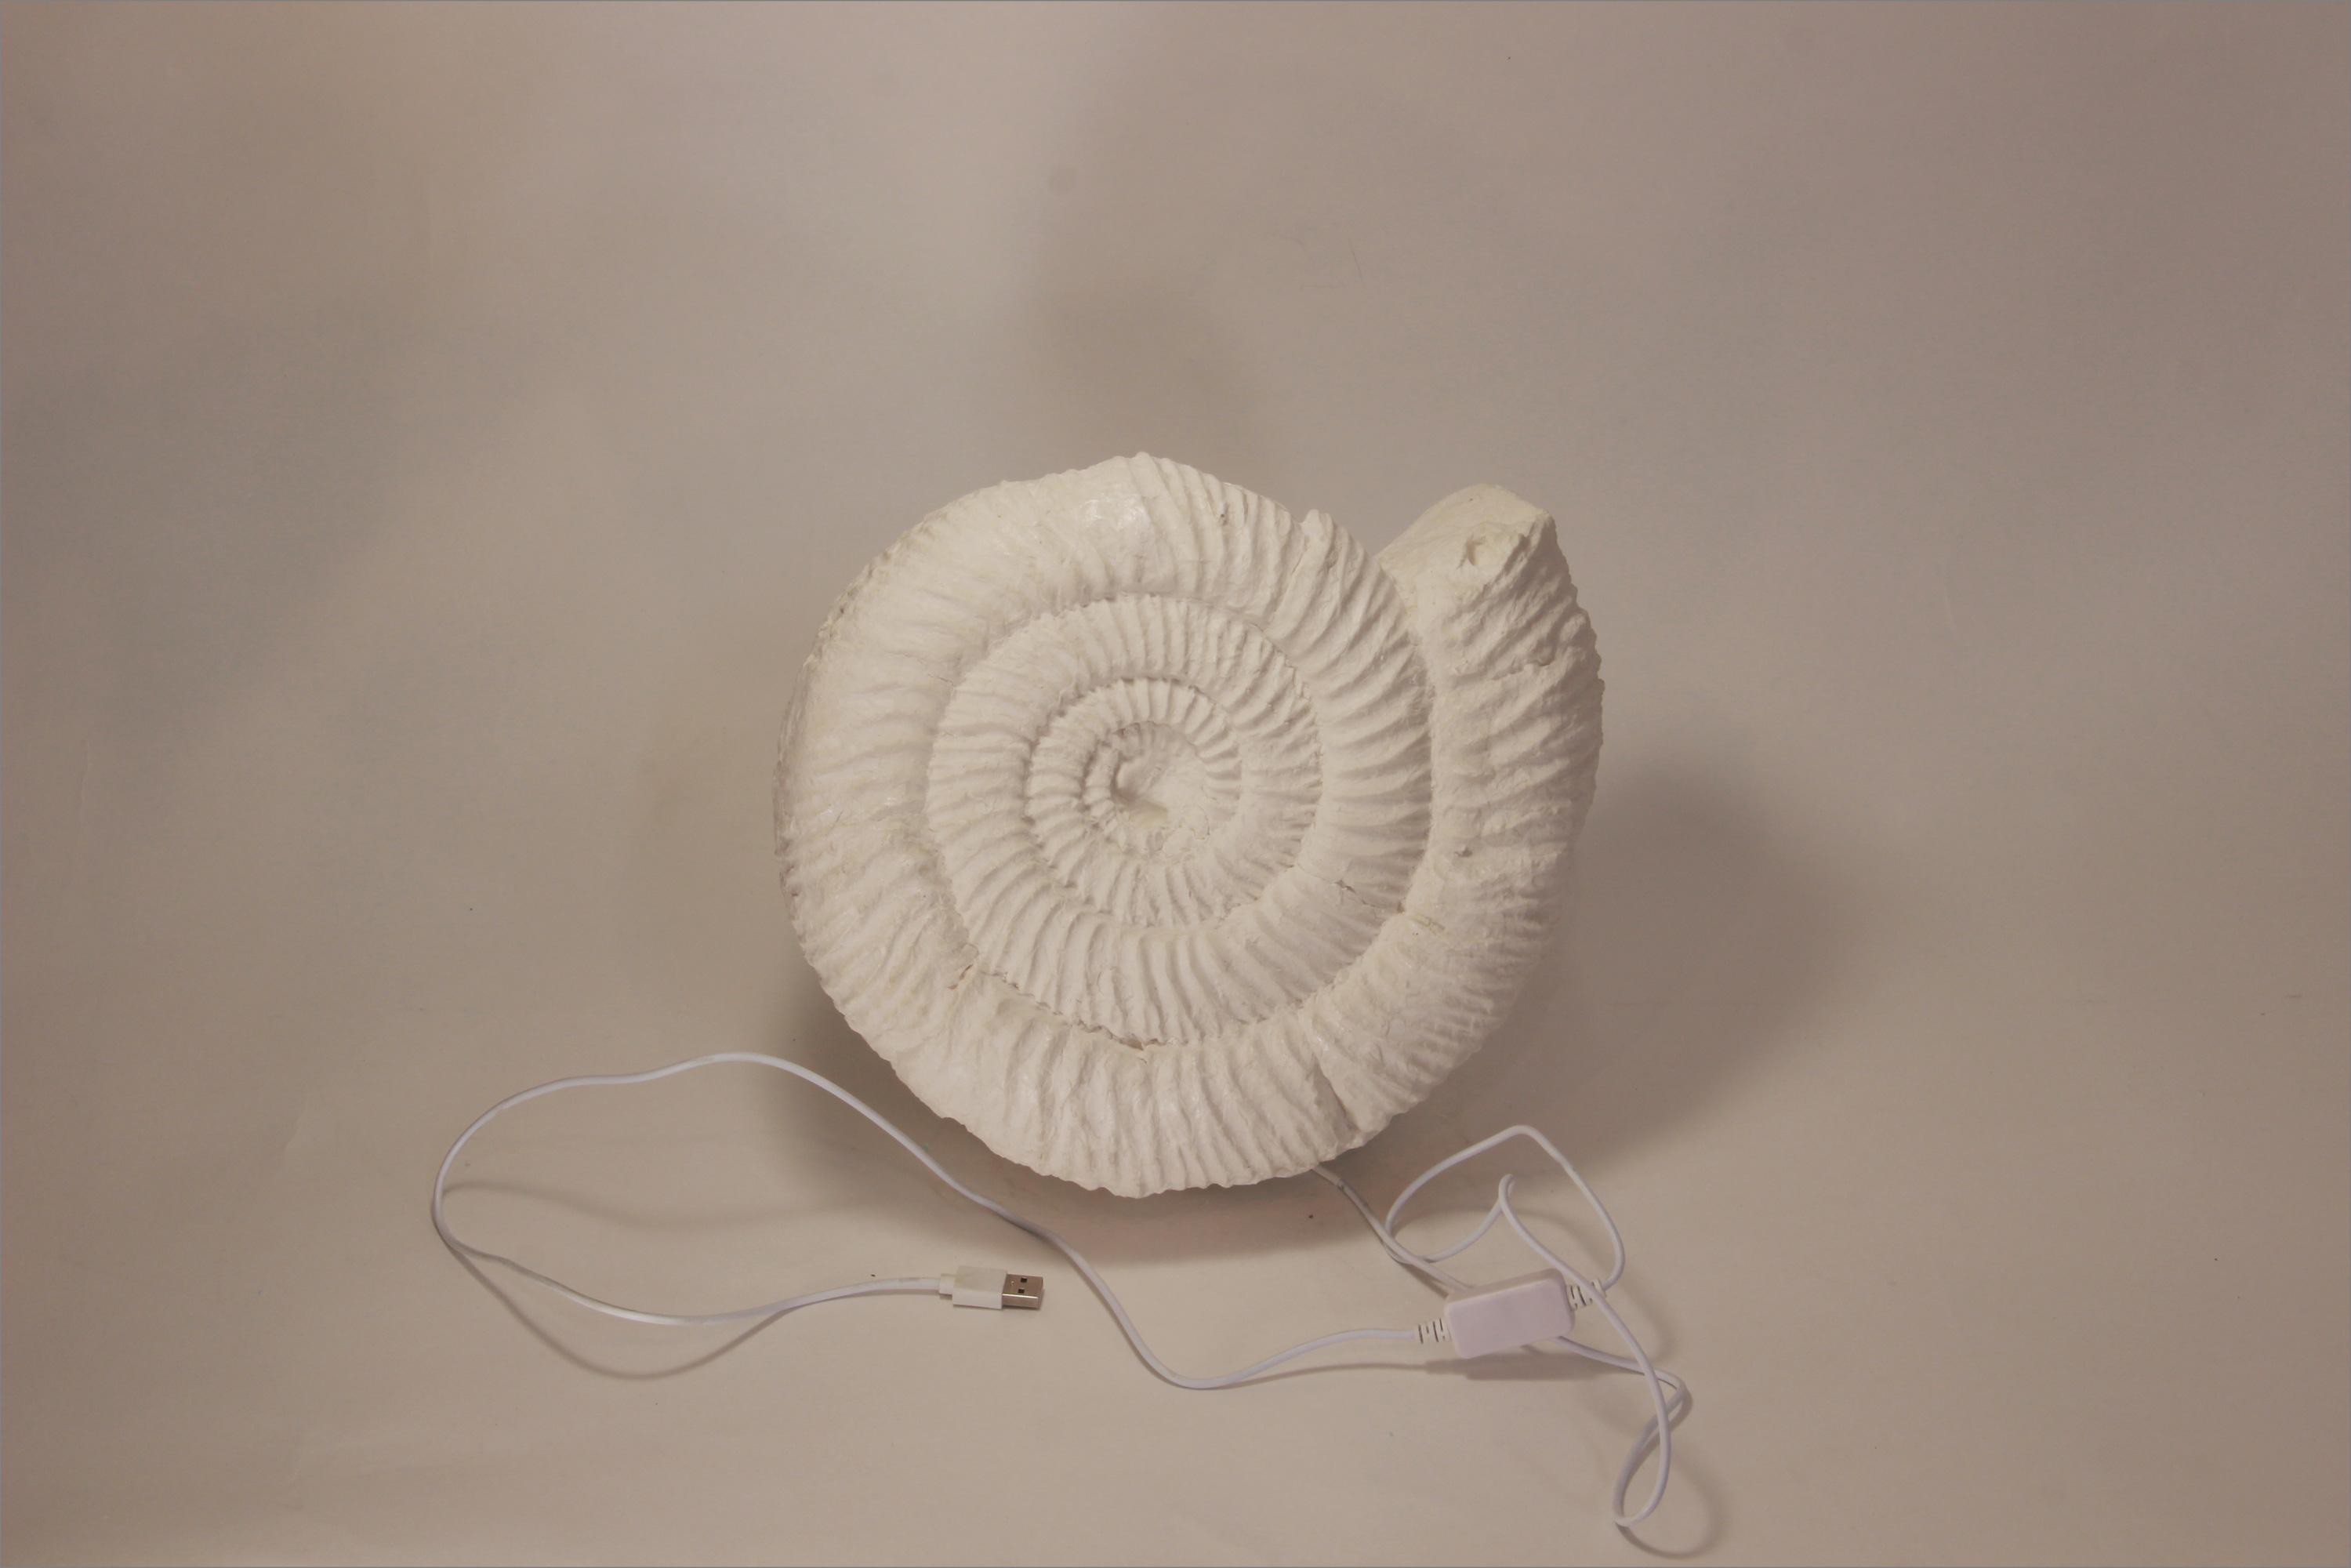 аммонит, ammonites